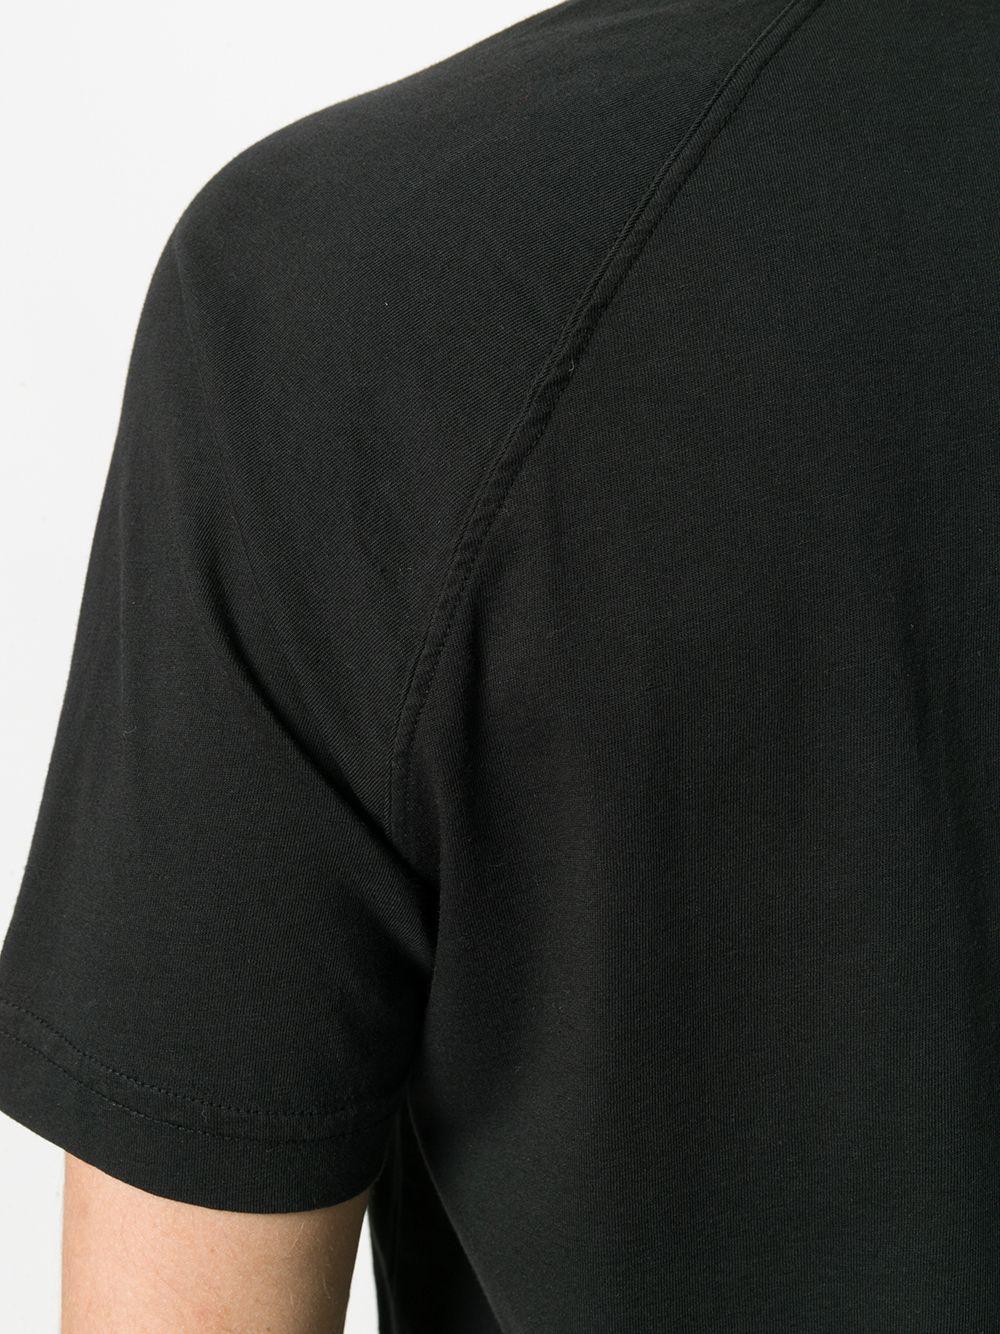 POCKET T-SHIRT ASPESI   T-shirts   AY28 A33501241